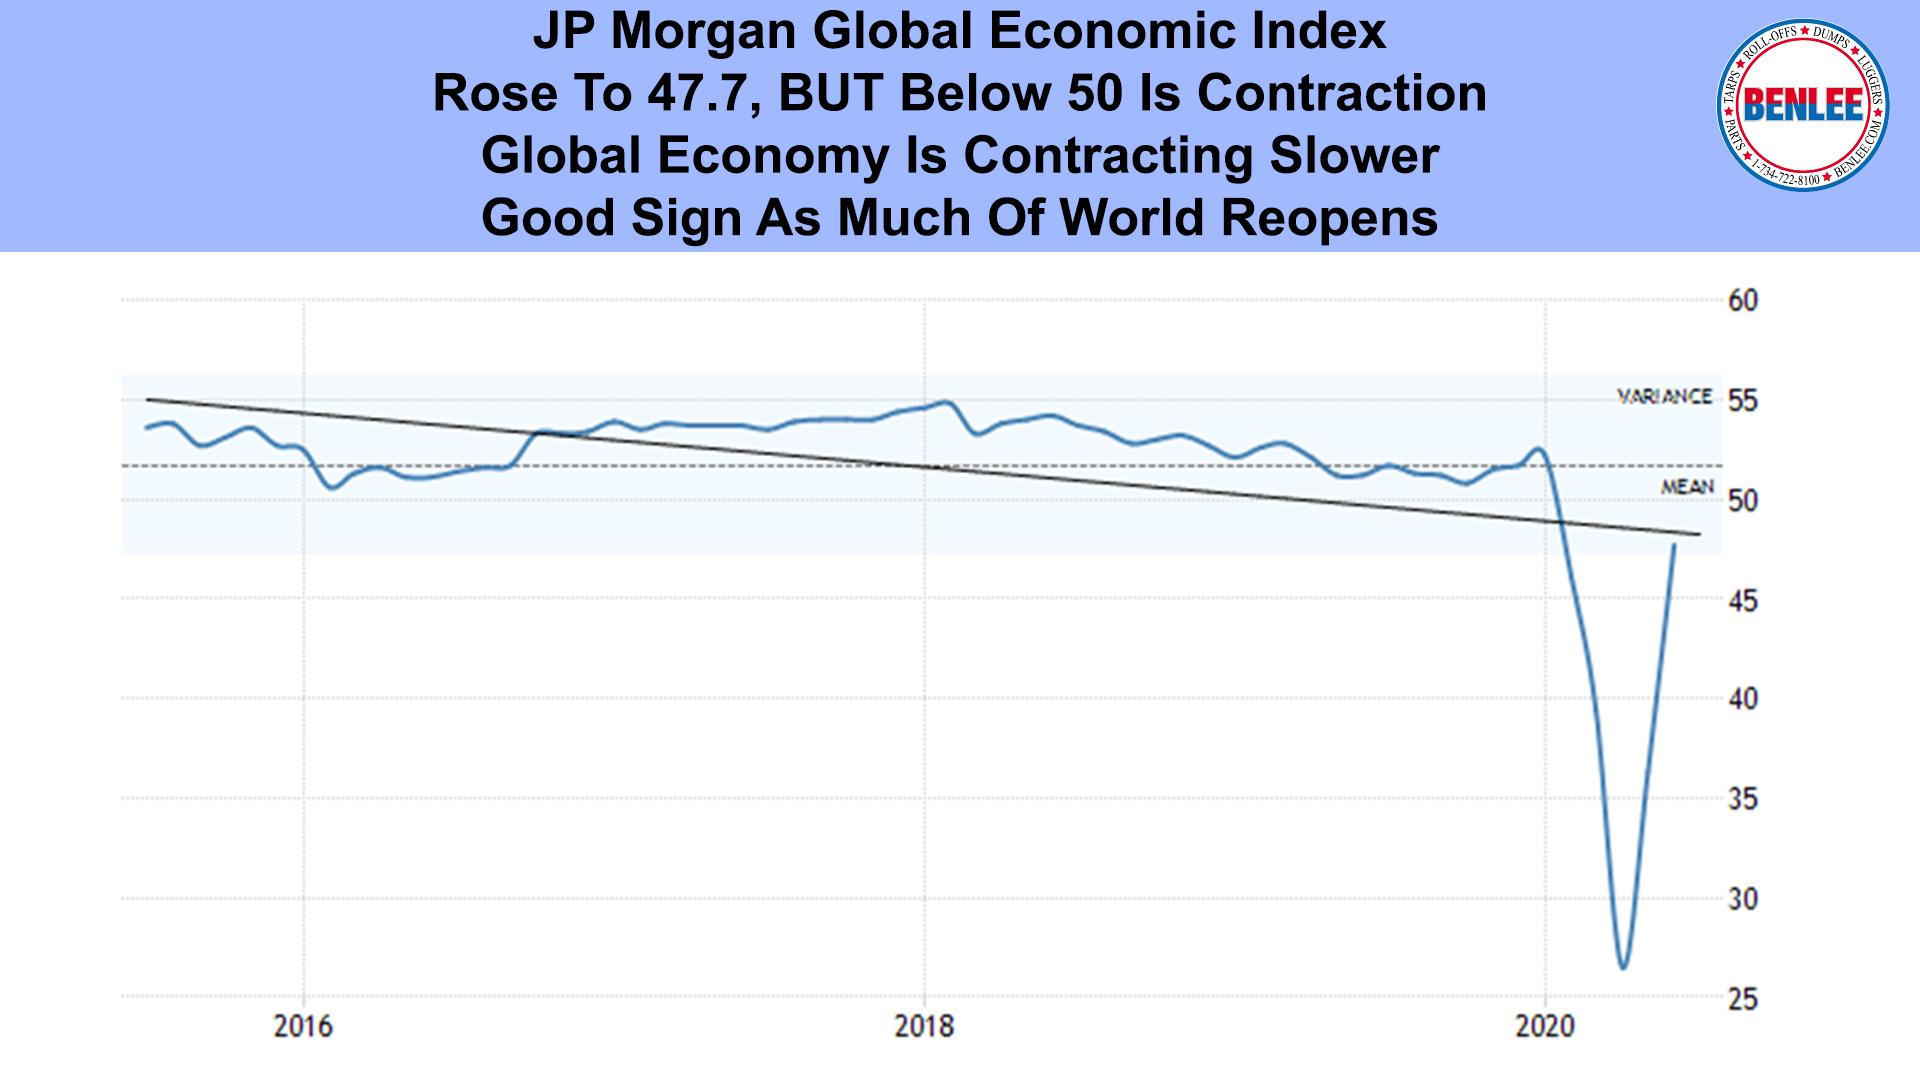 JP Morgan Global Economic Index